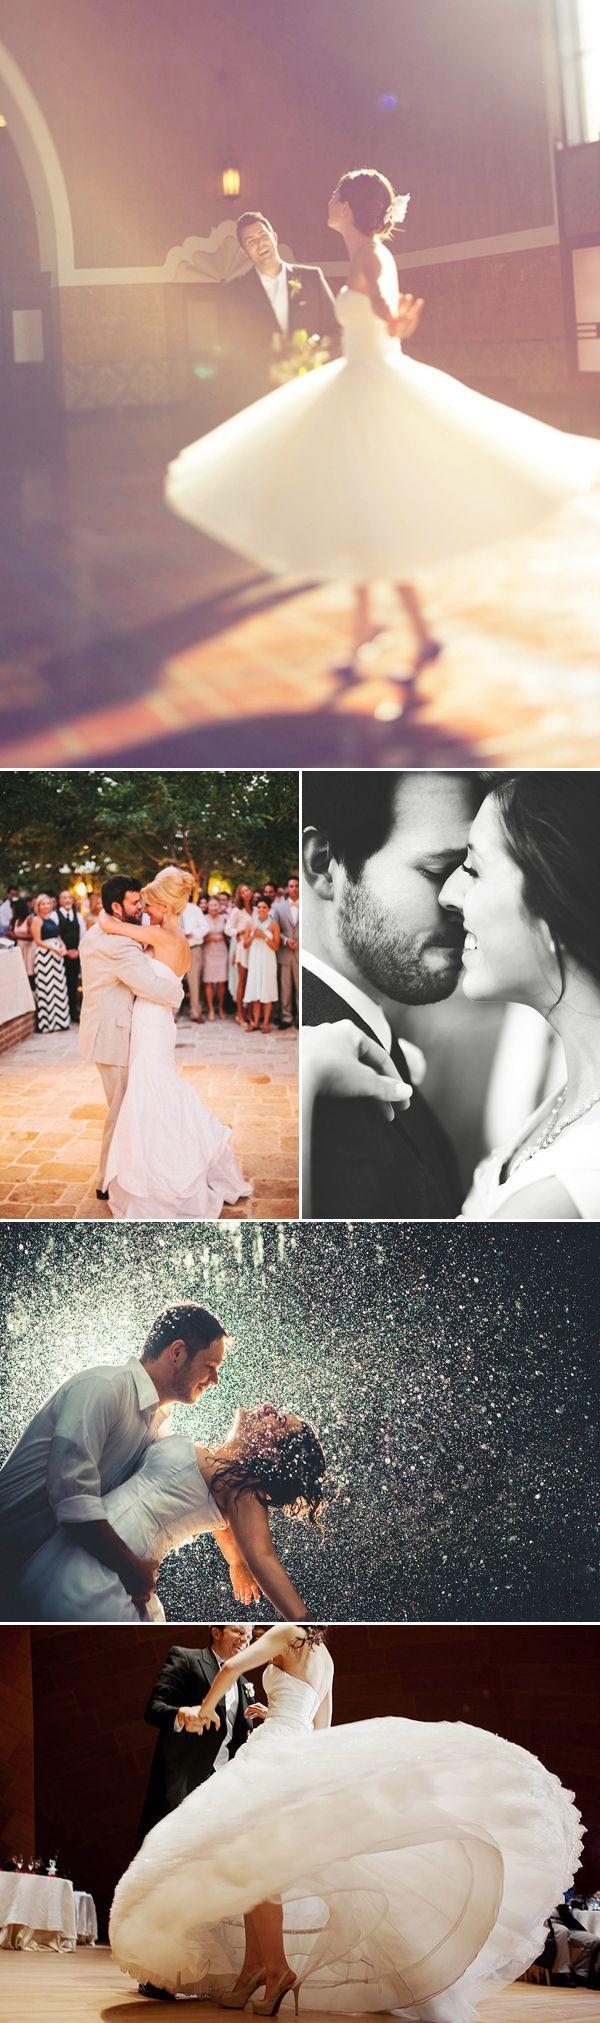 Romantic First Dance Scenes & Songs